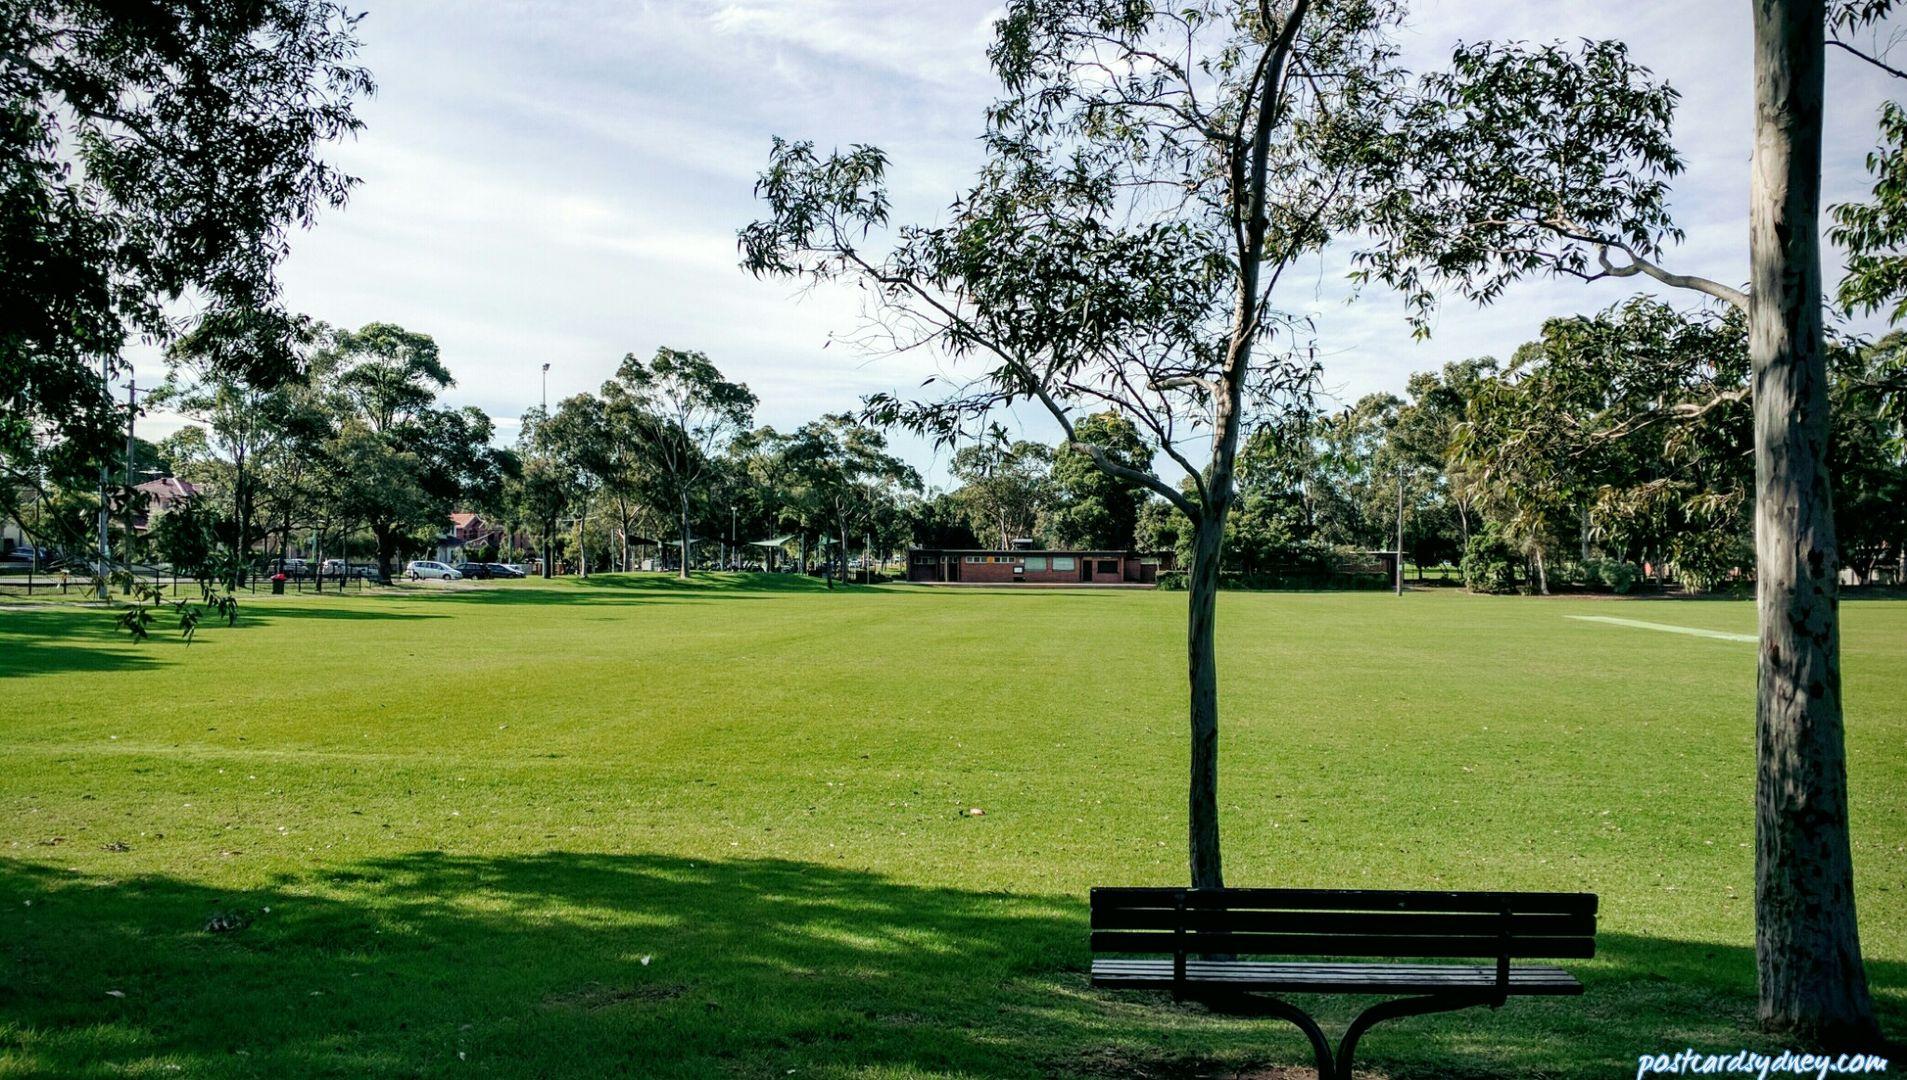 149-151 Wentworth Road, Strathfield NSW 2135, Image 1